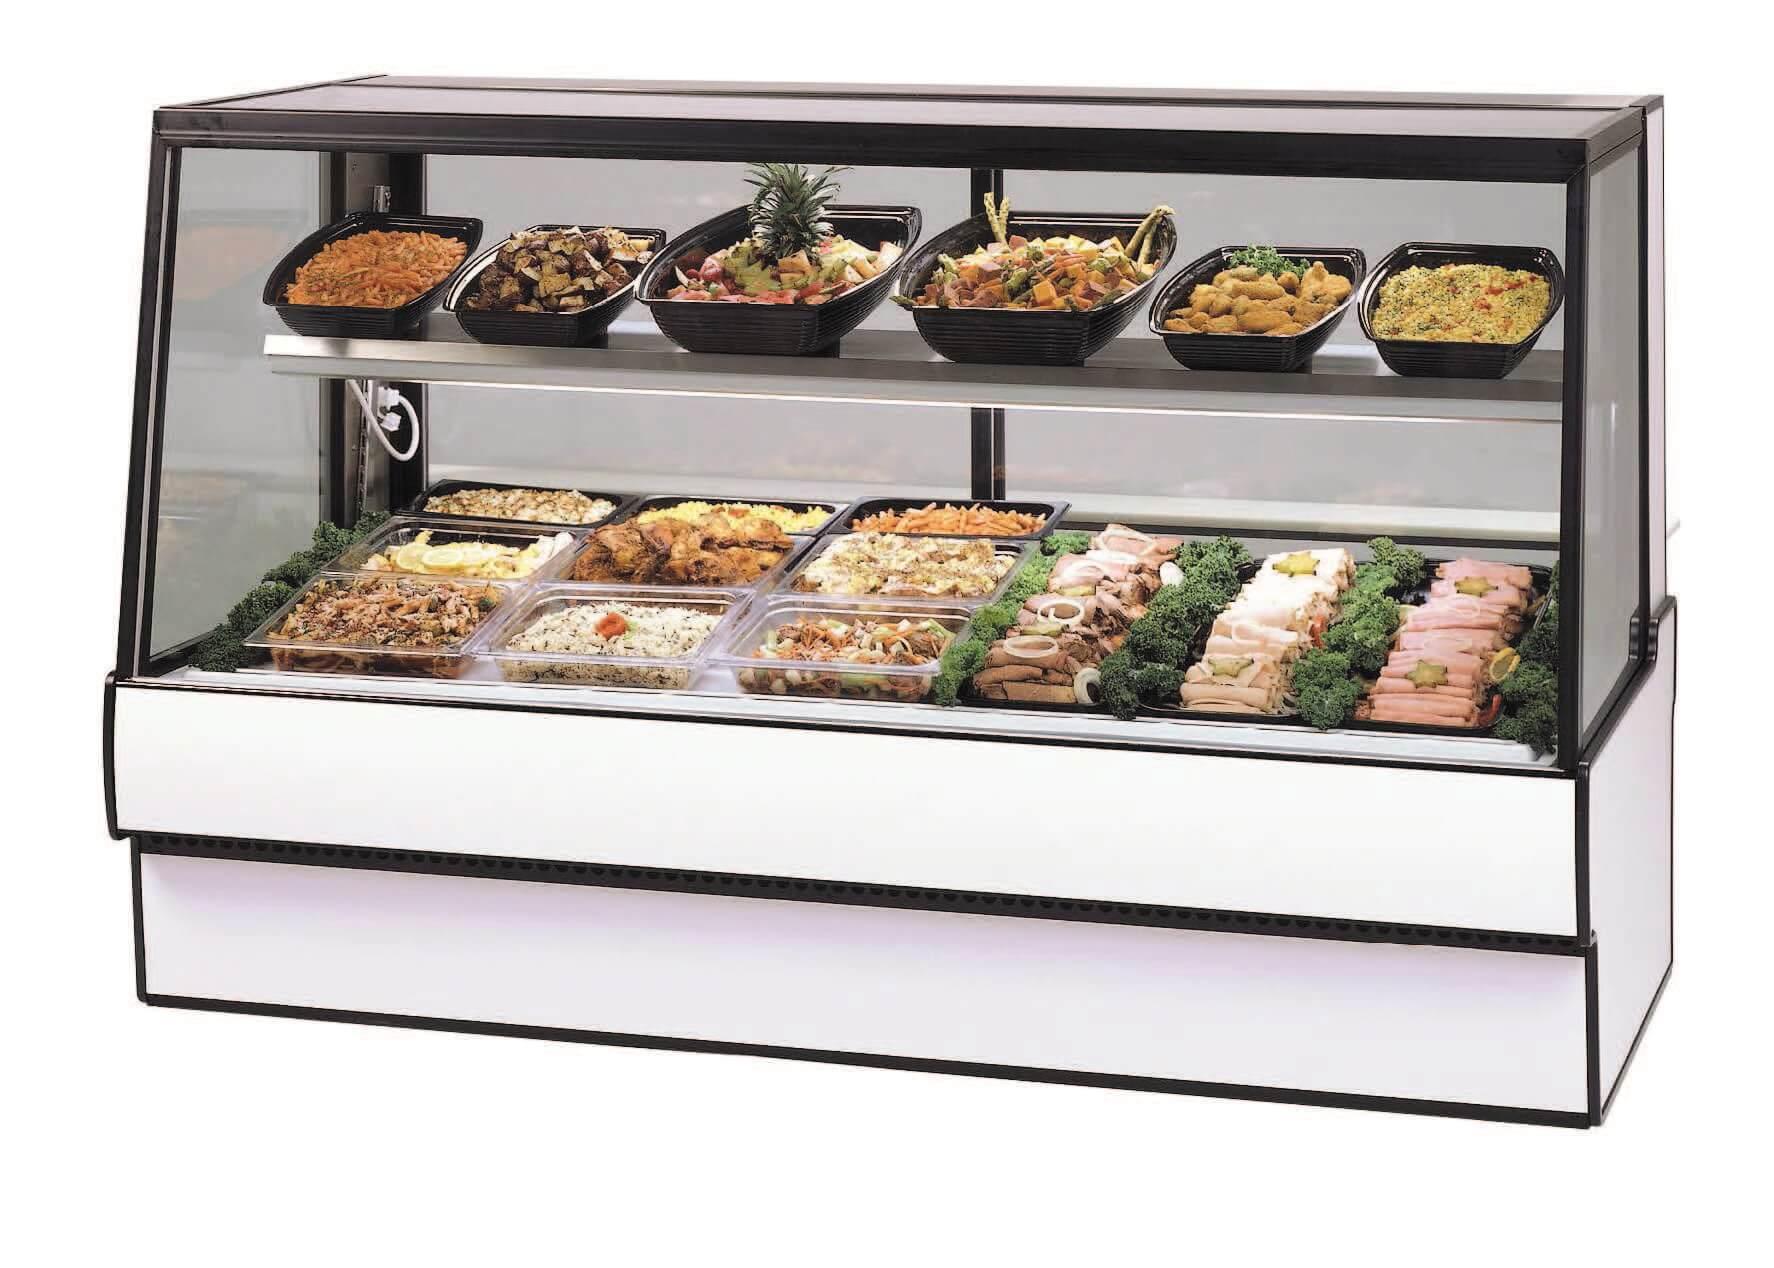 sgr3648cd-high-volume-refrigerated-deli-case1